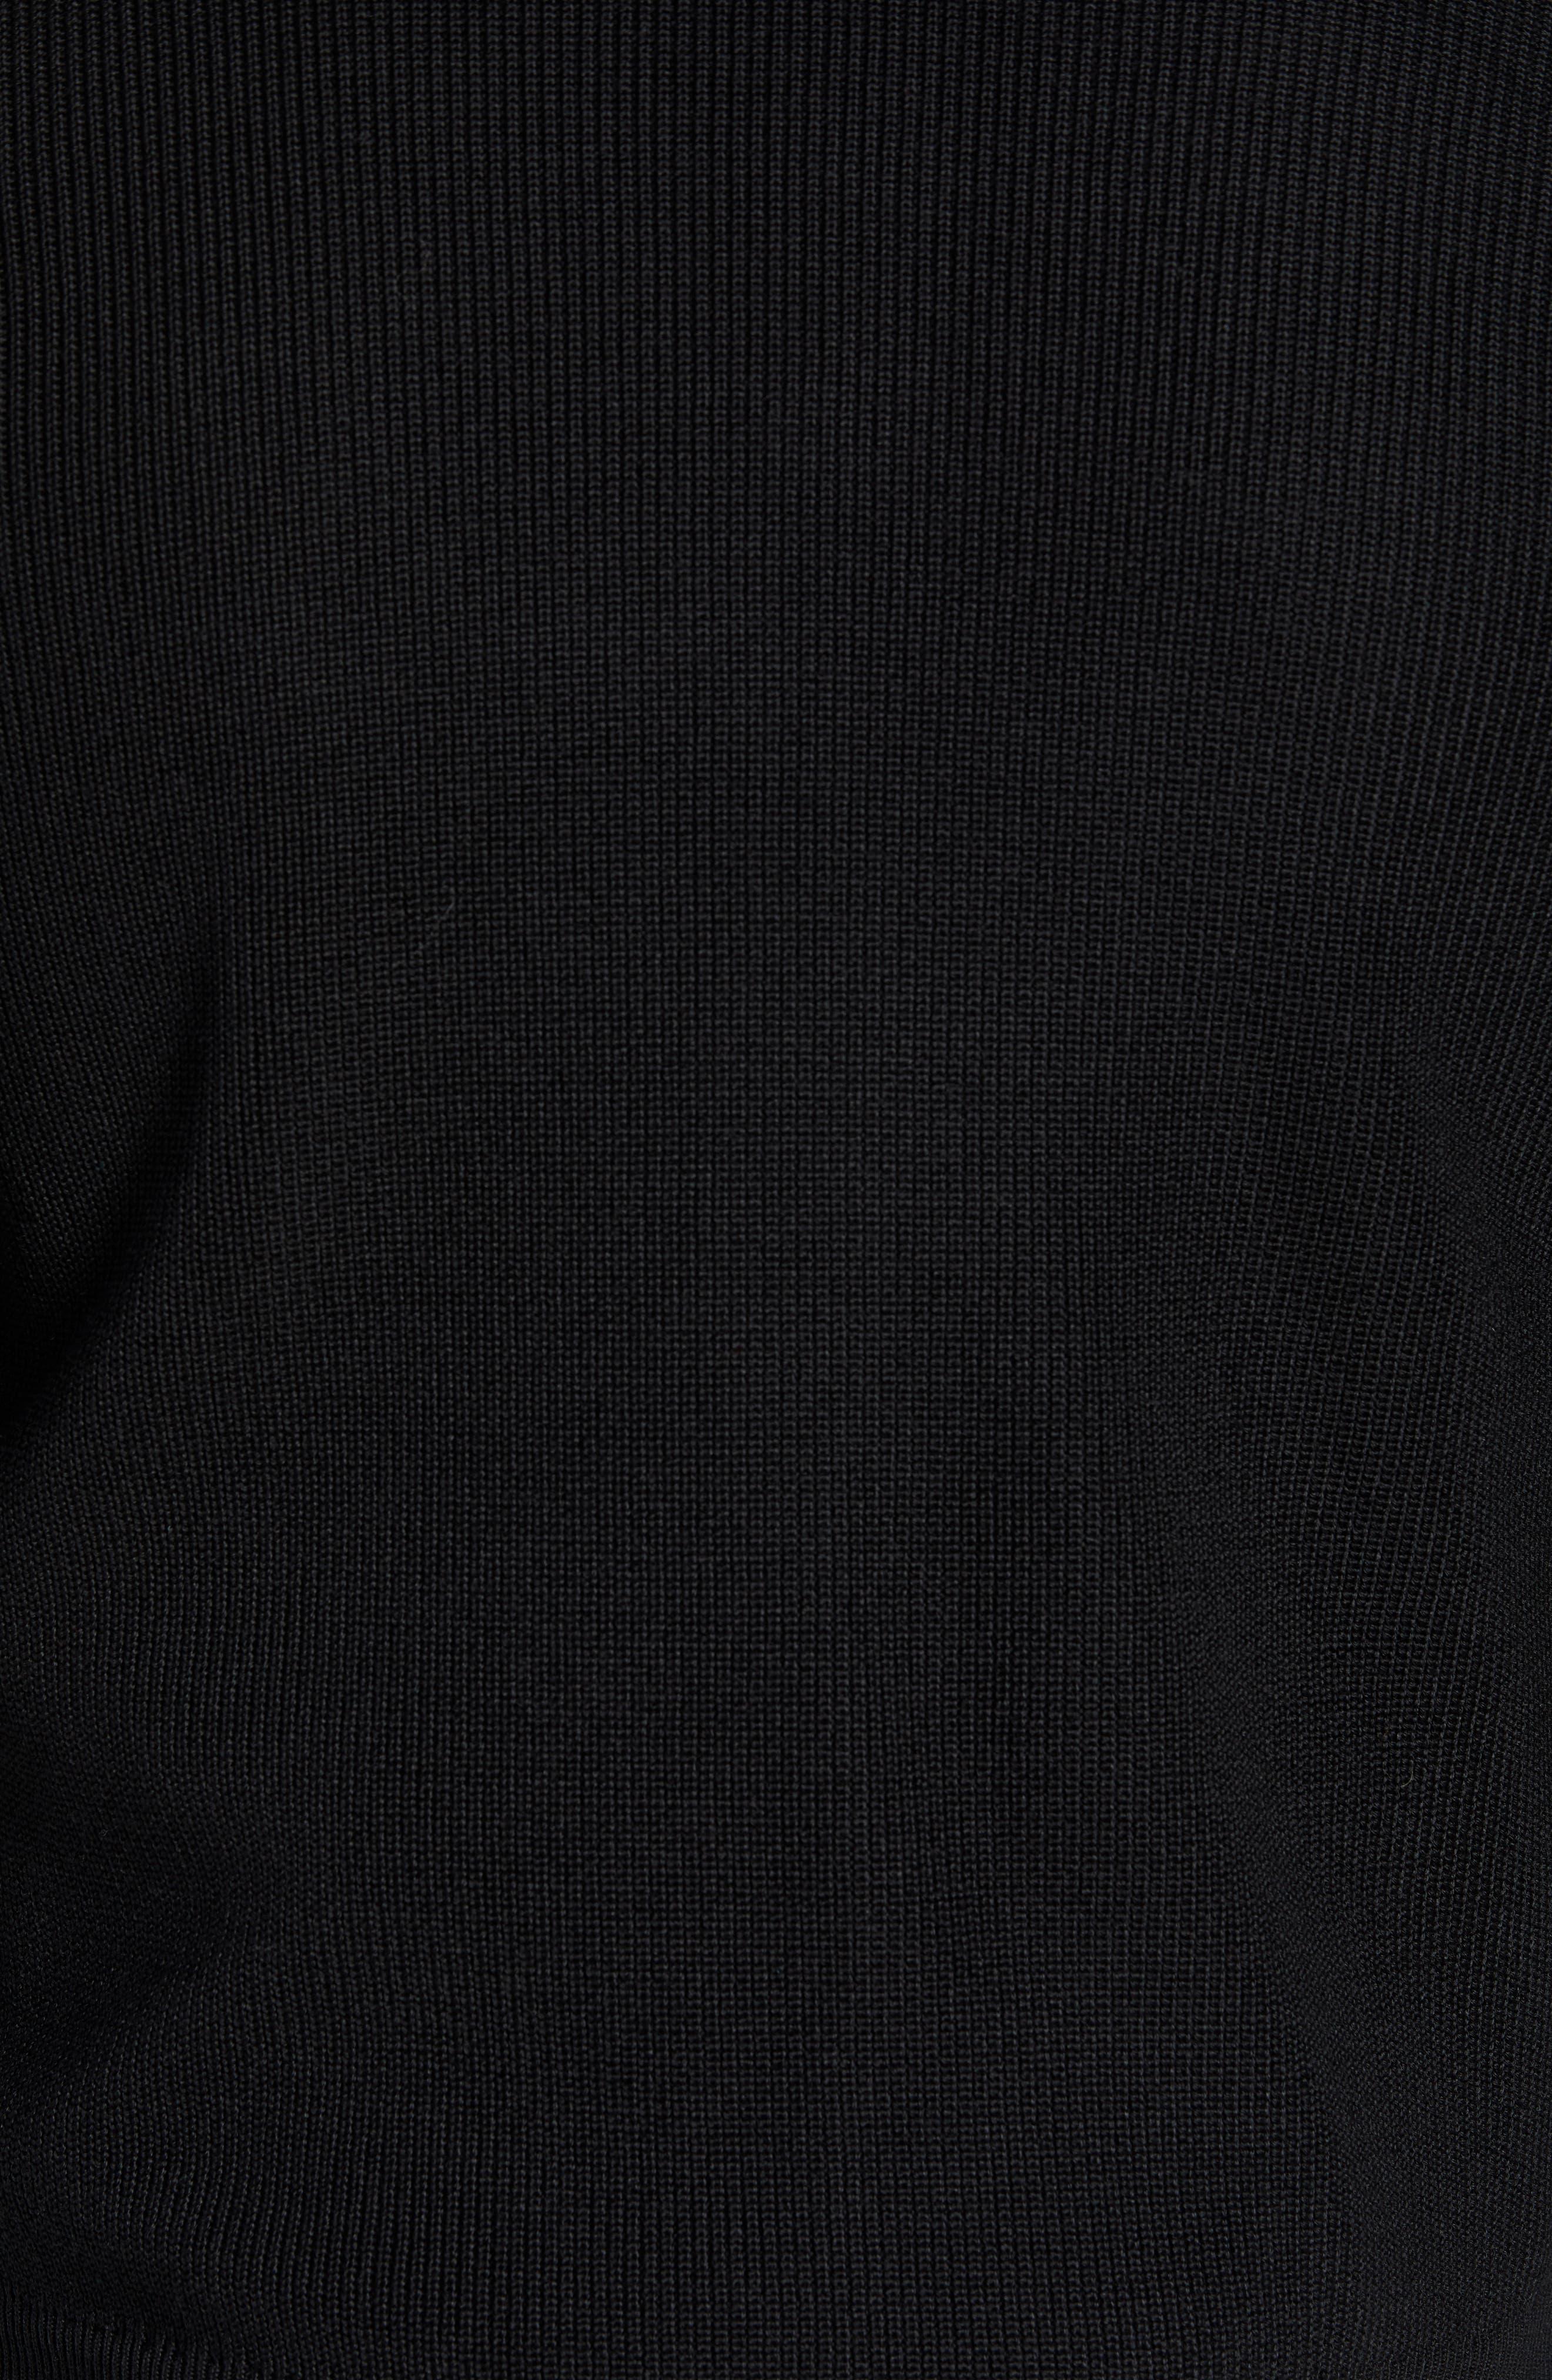 Water Resistant Merino Wool Blend Sweater,                             Alternate thumbnail 6, color,                             BLACK